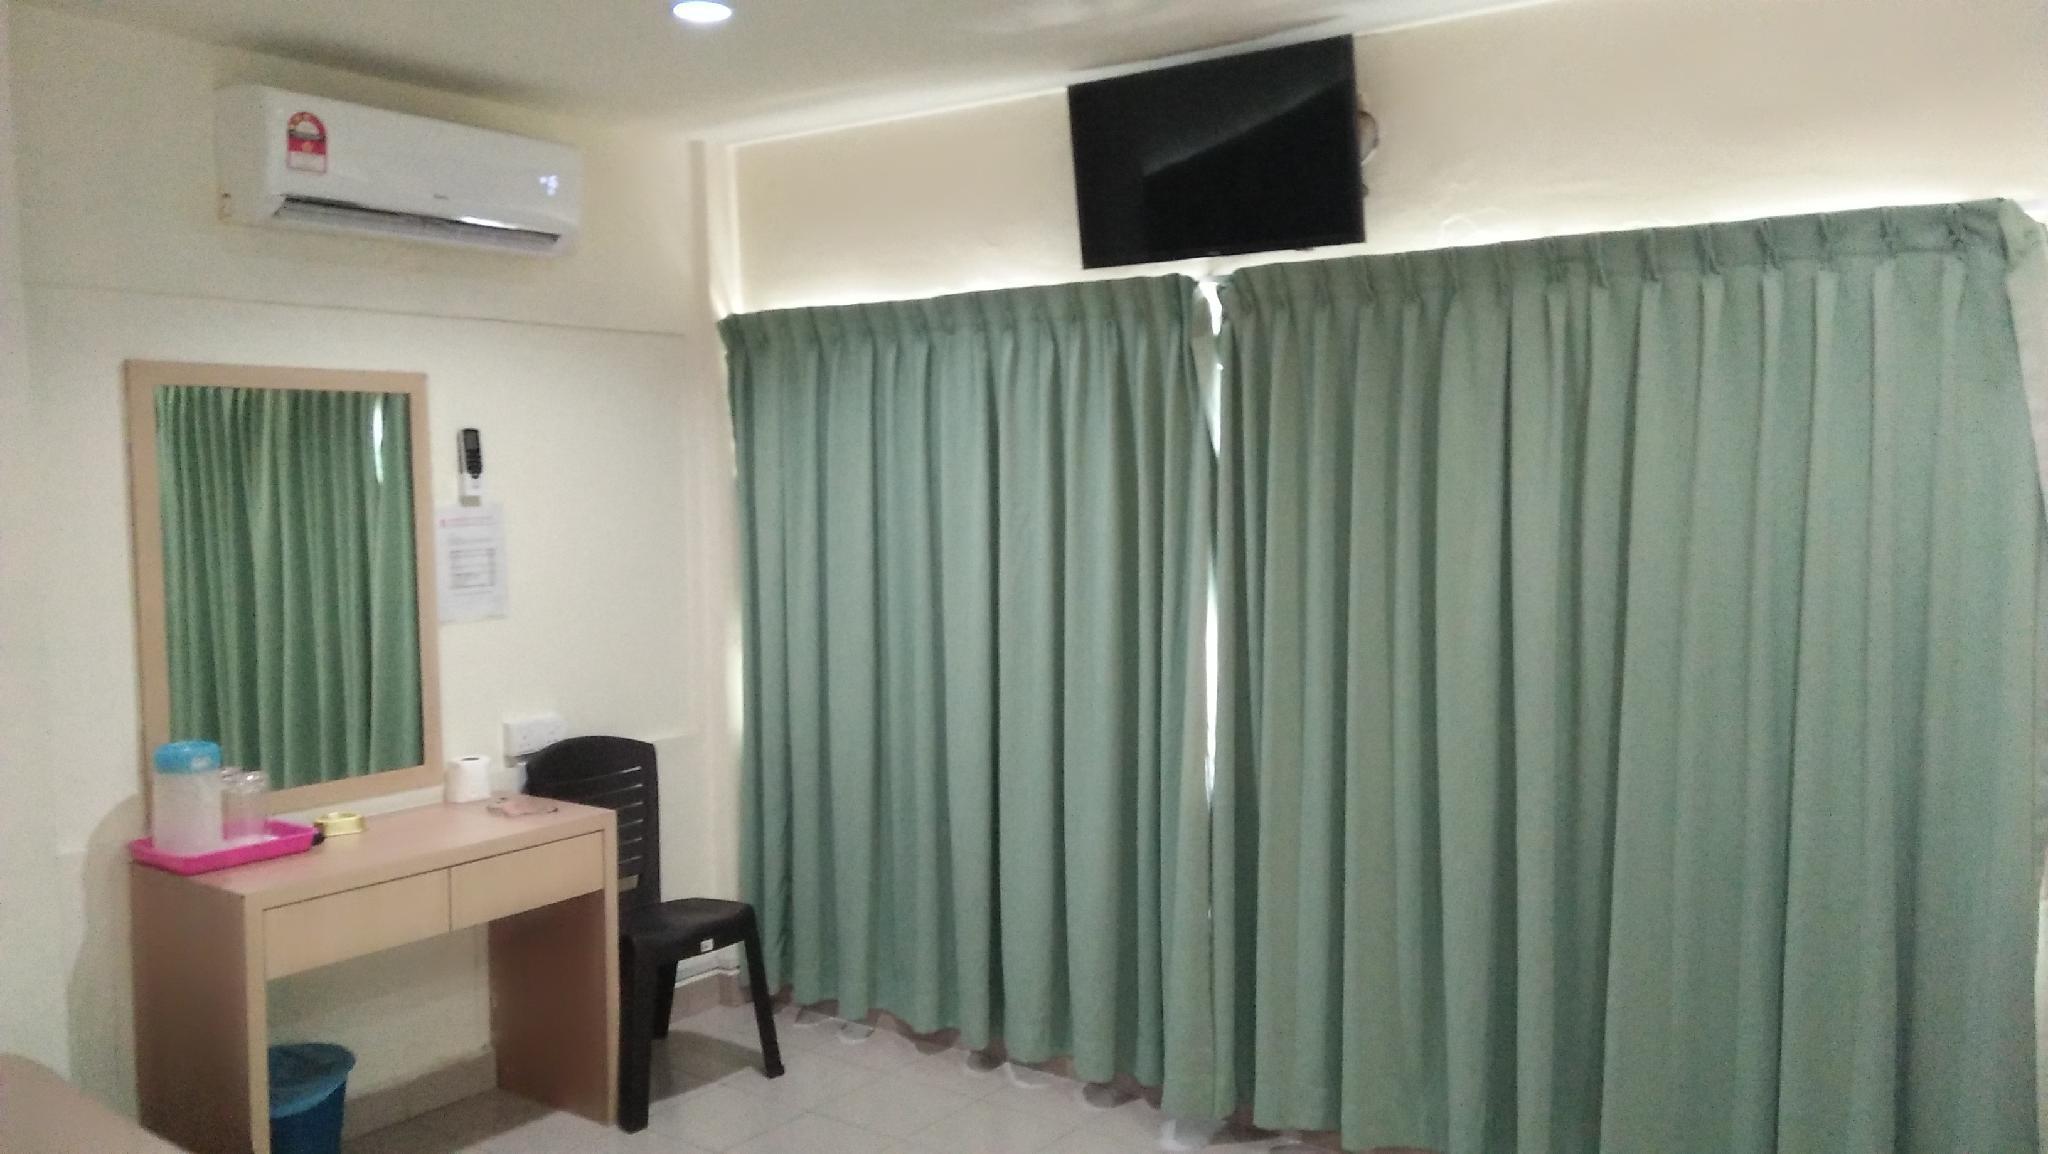 Dragon Inn Premium Hotel ( J.B) Sdn Bhd, Johor Bahru